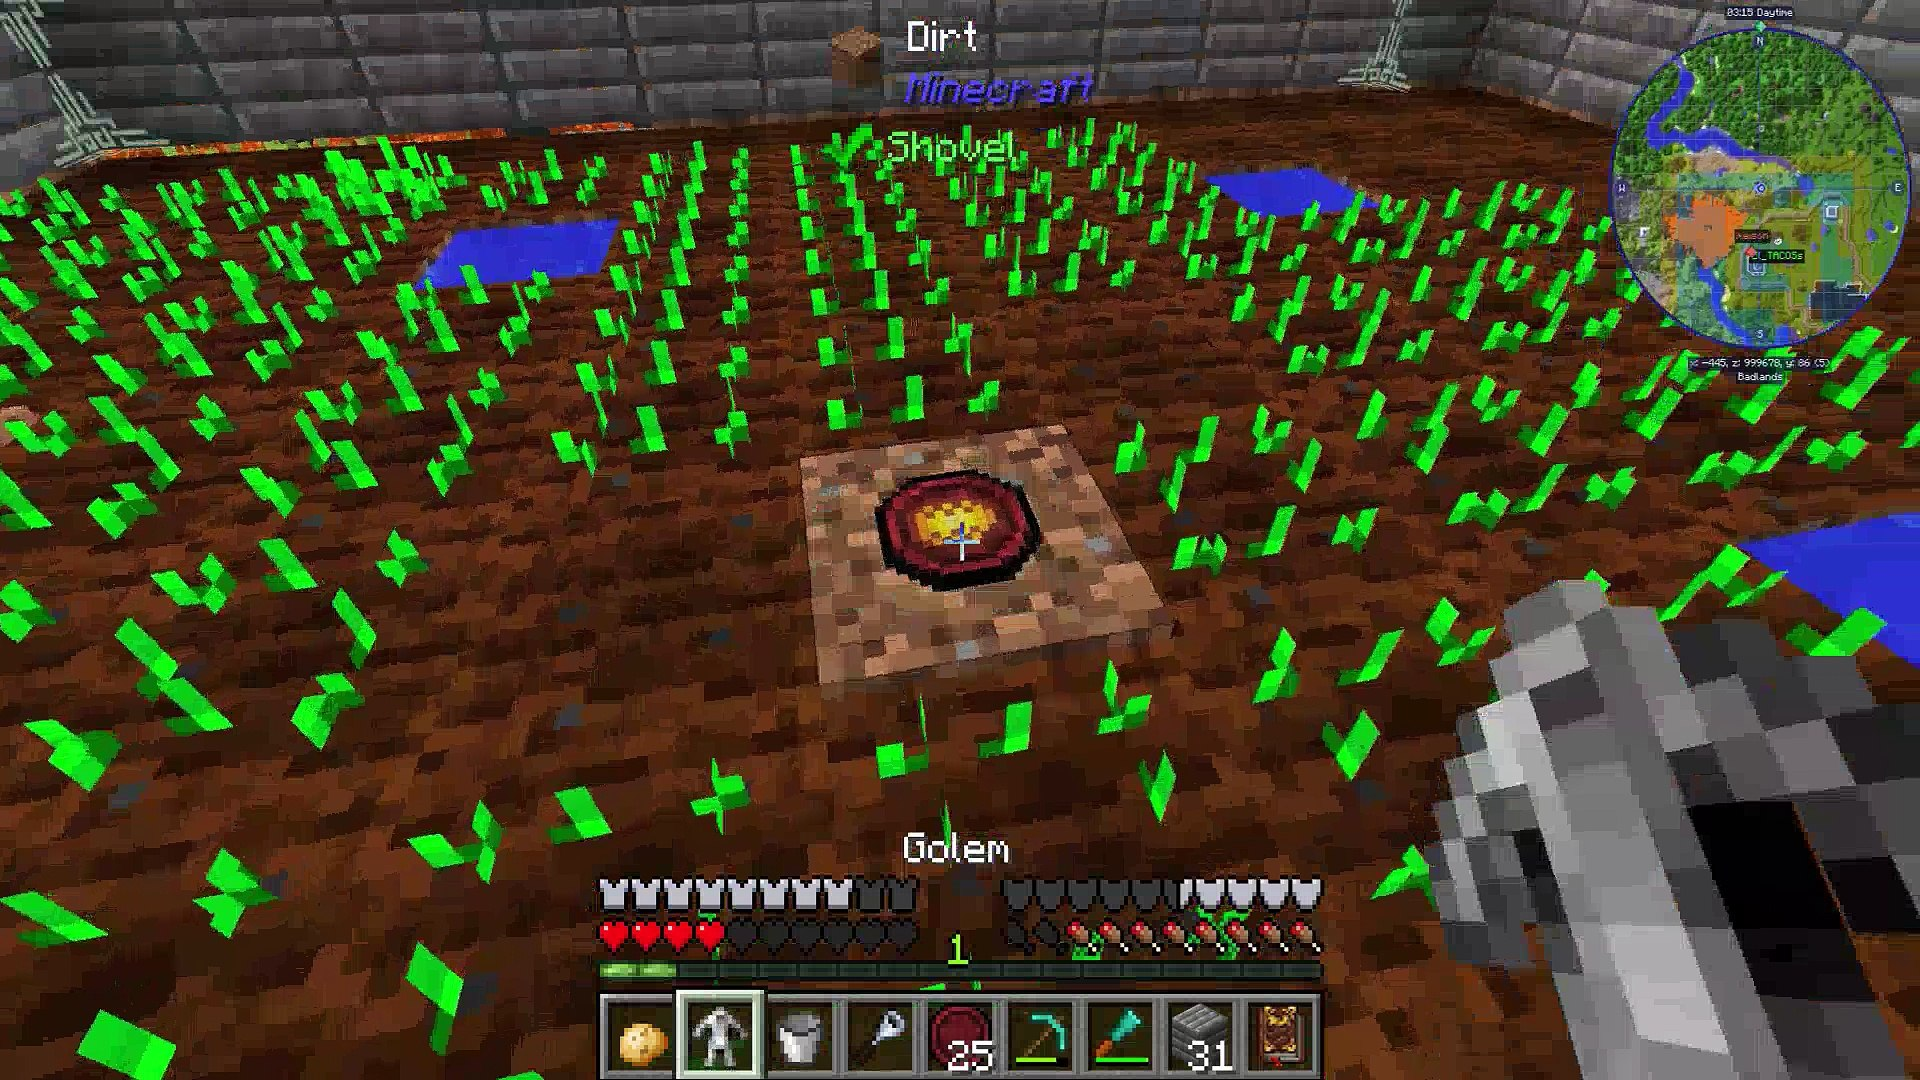 [Minecraft ftb revelation] Farming matinal (07/09/2018 13:00)